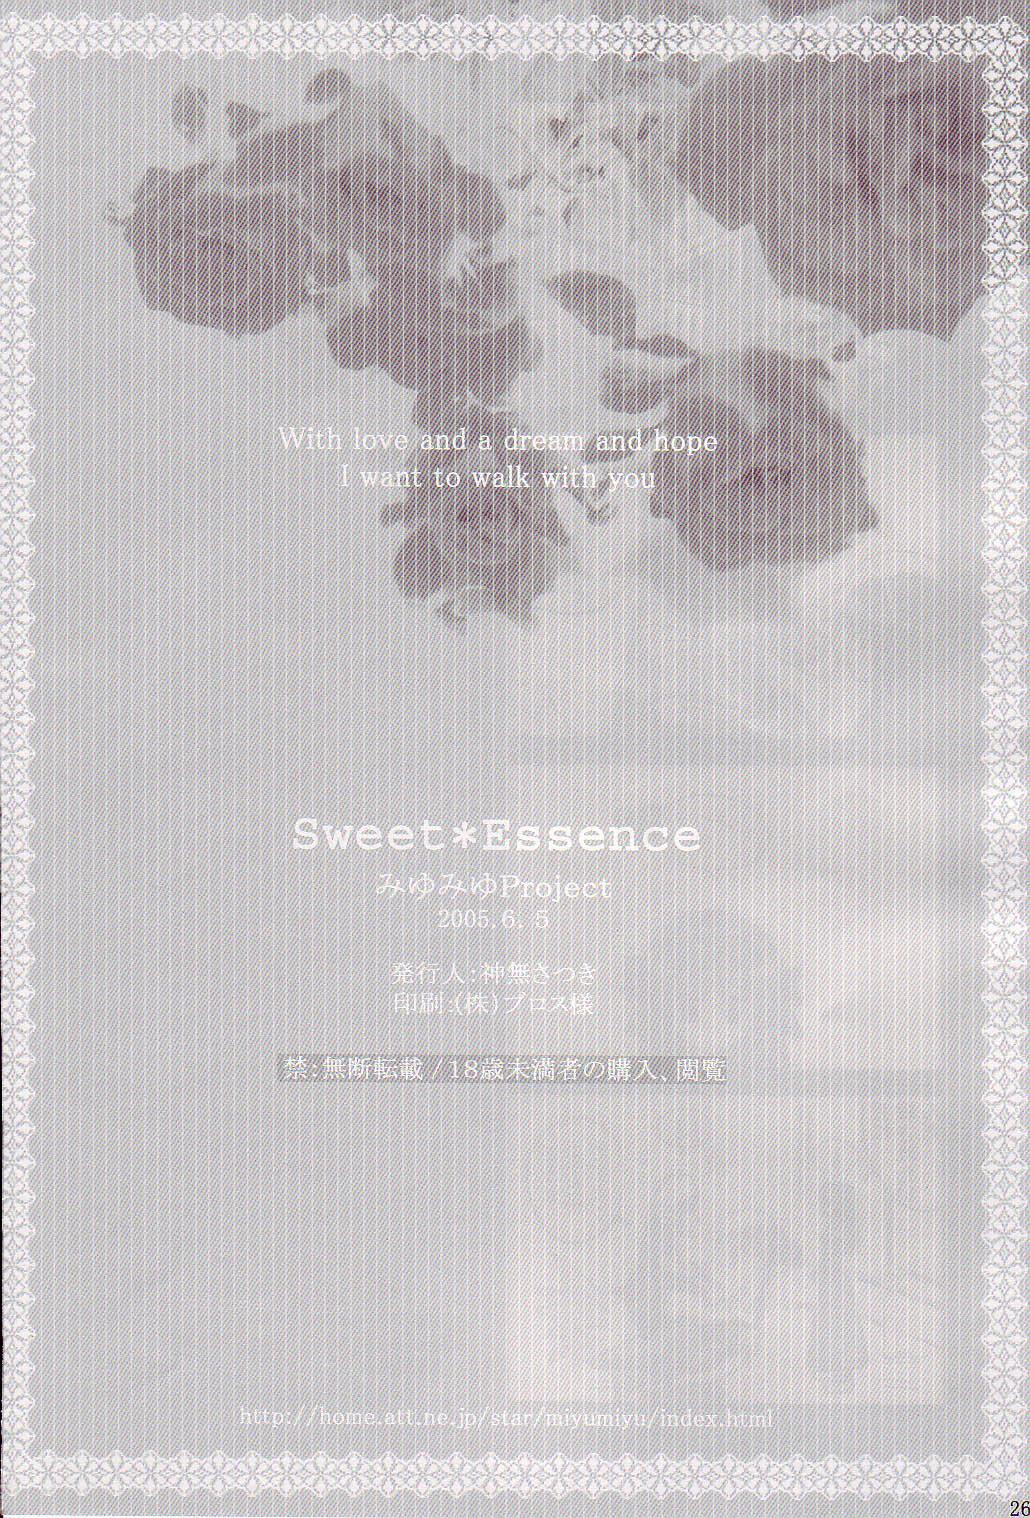 Sweet*Essence 25